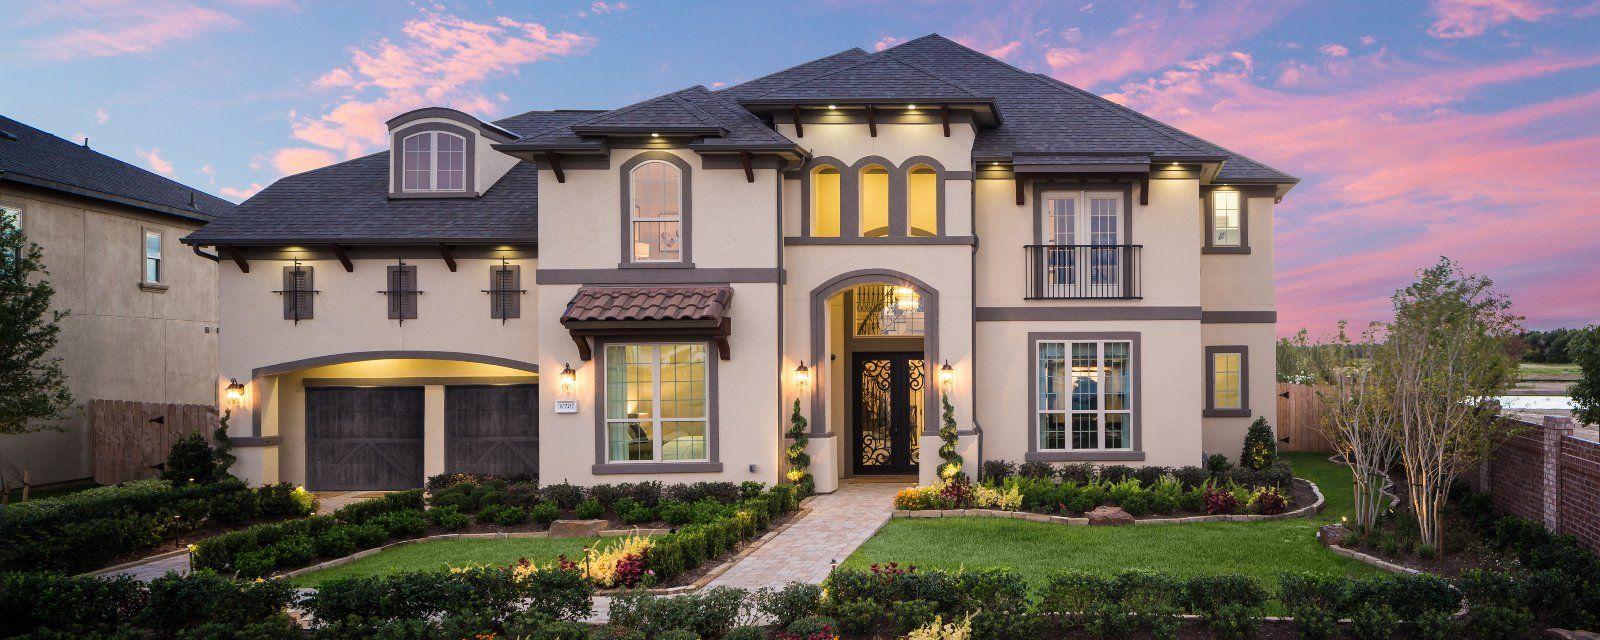 1526 Kaleta Pass, League City, TX Homes & Land - Real Estate